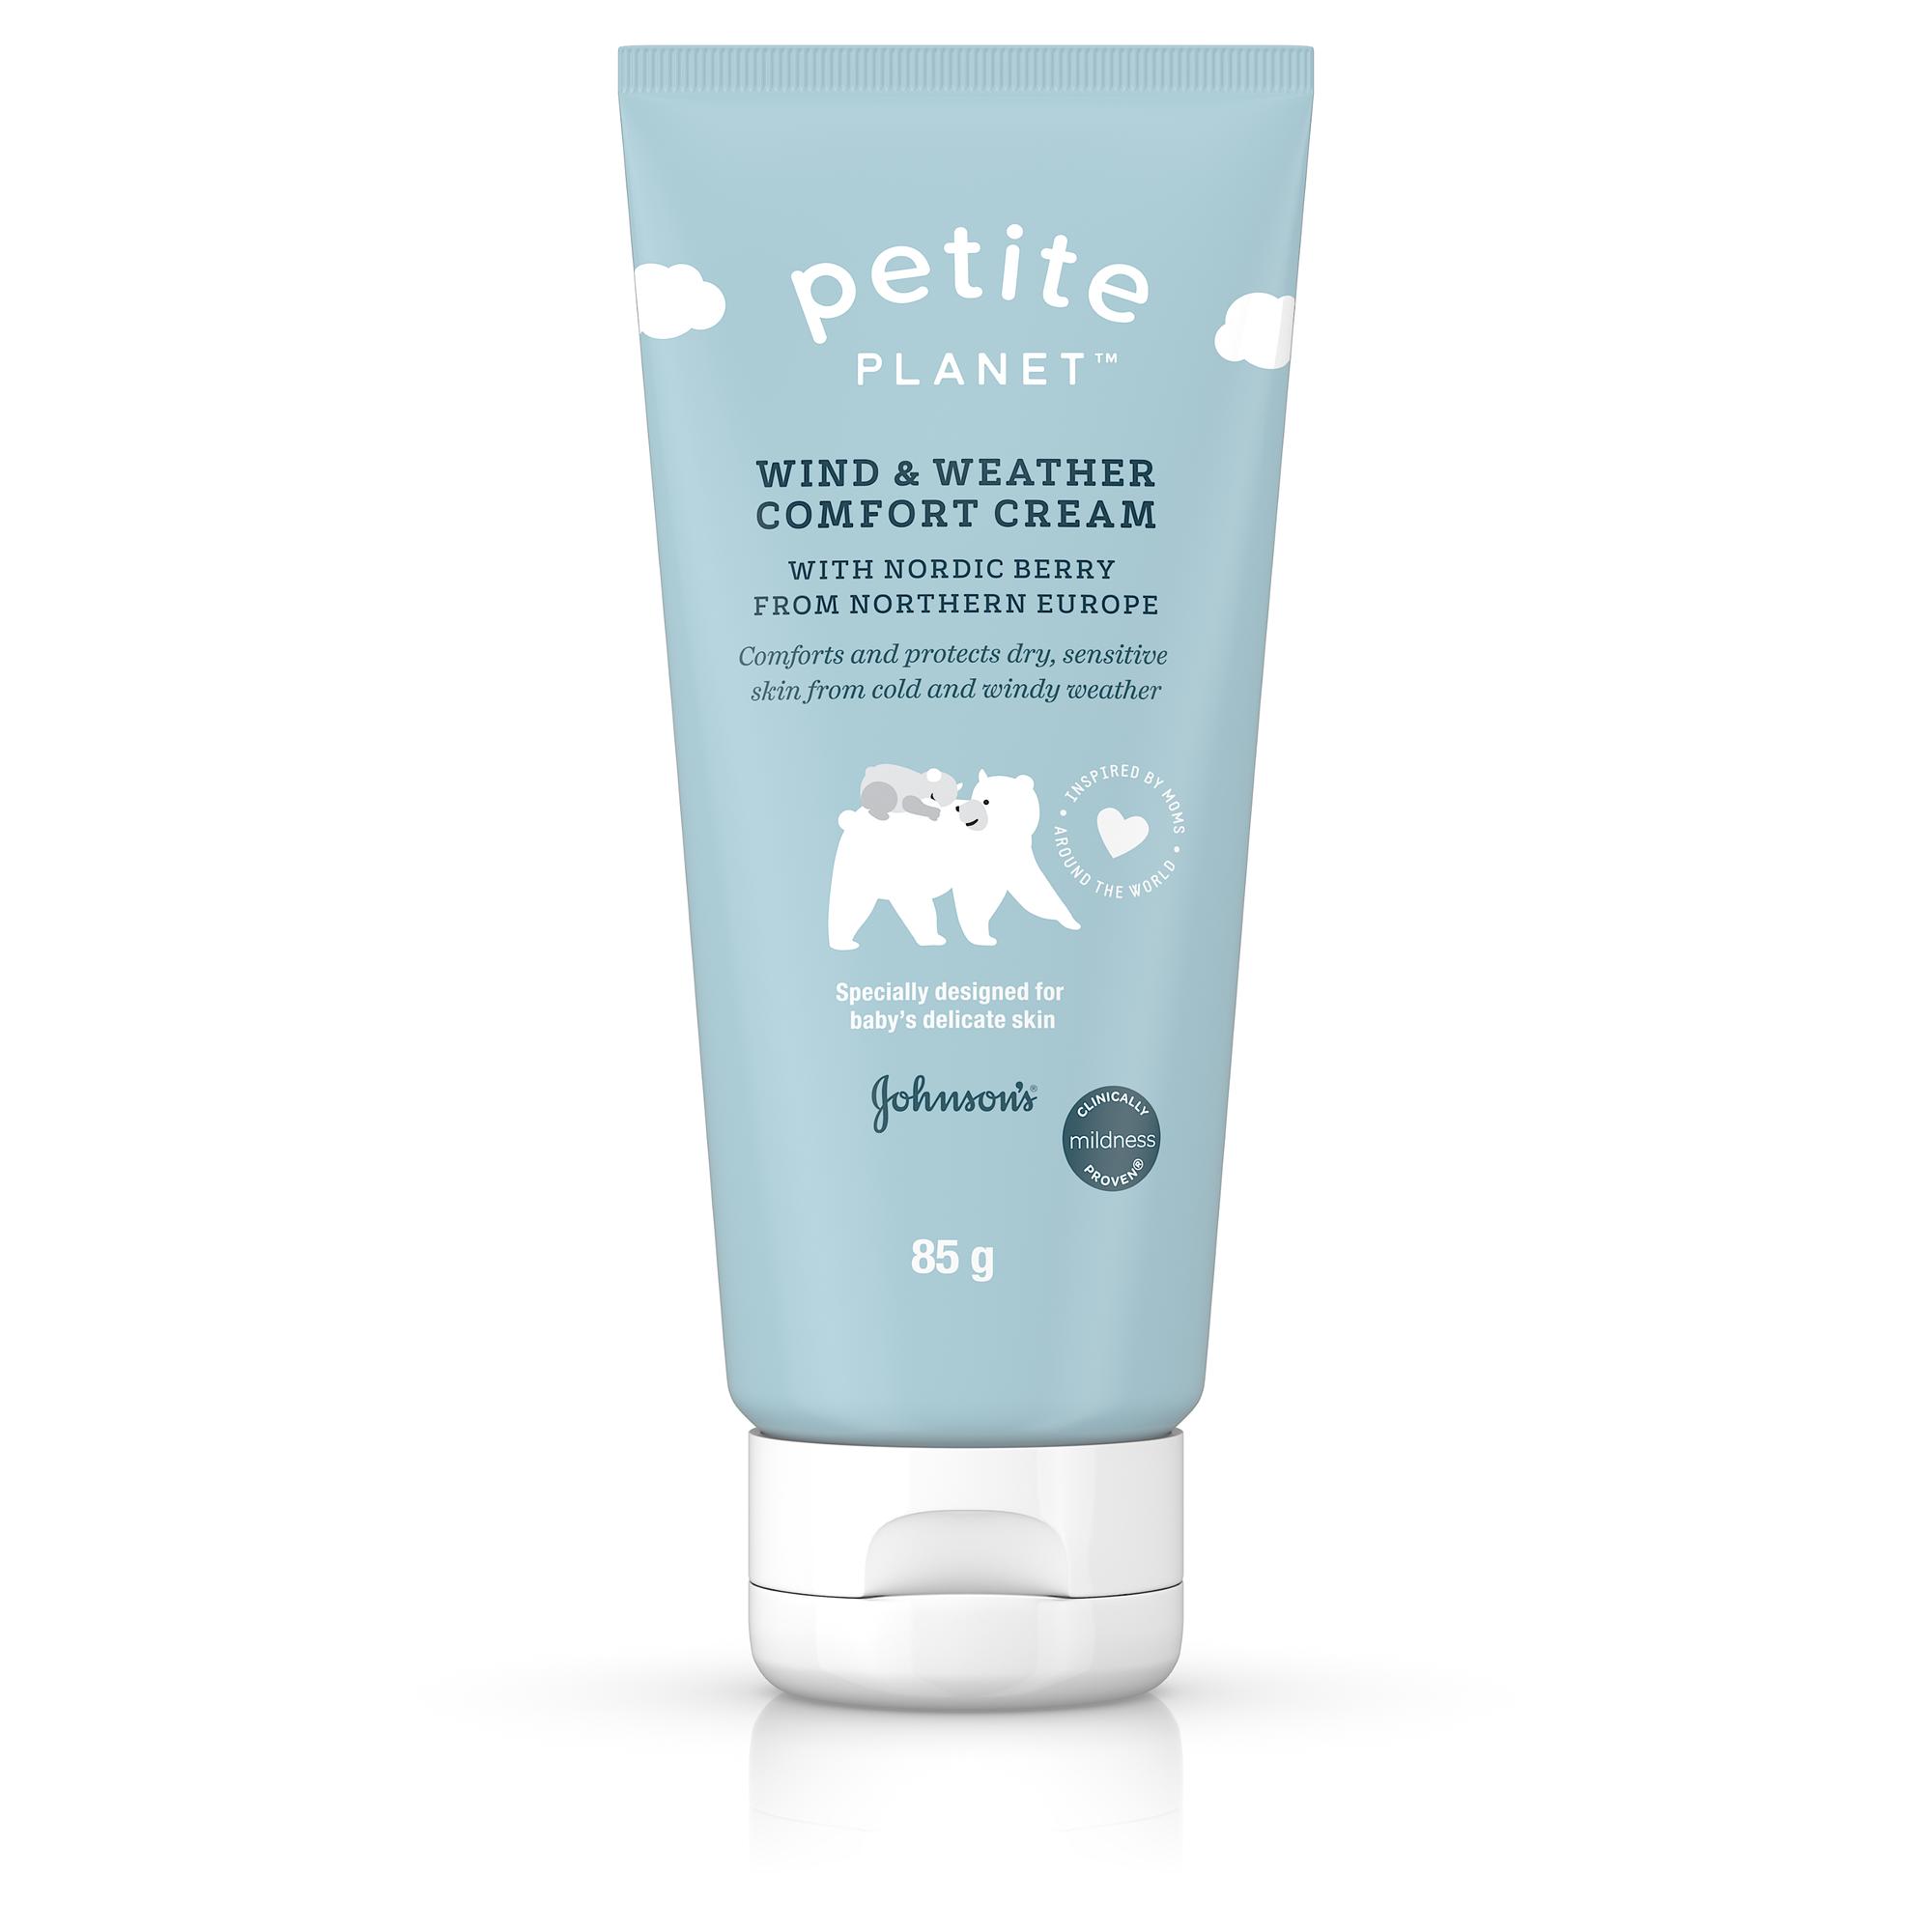 Petite Planet Moisturising Face & Hand Cream